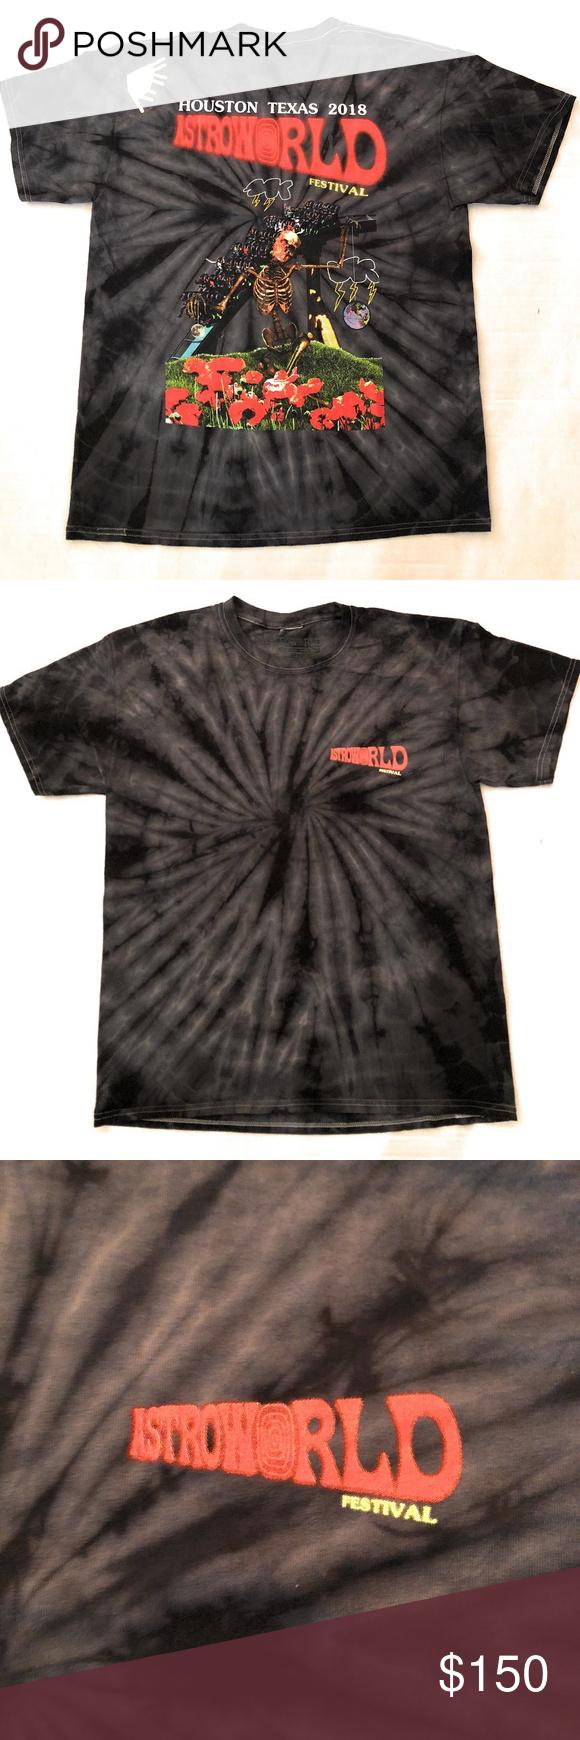 Travis Scott Astroworld Festival Limited Shirt Travis Scott Astroworld Astroworld Festival Black T Shirt Size Limited Shirt Travis Scott Shirt Travis Scott